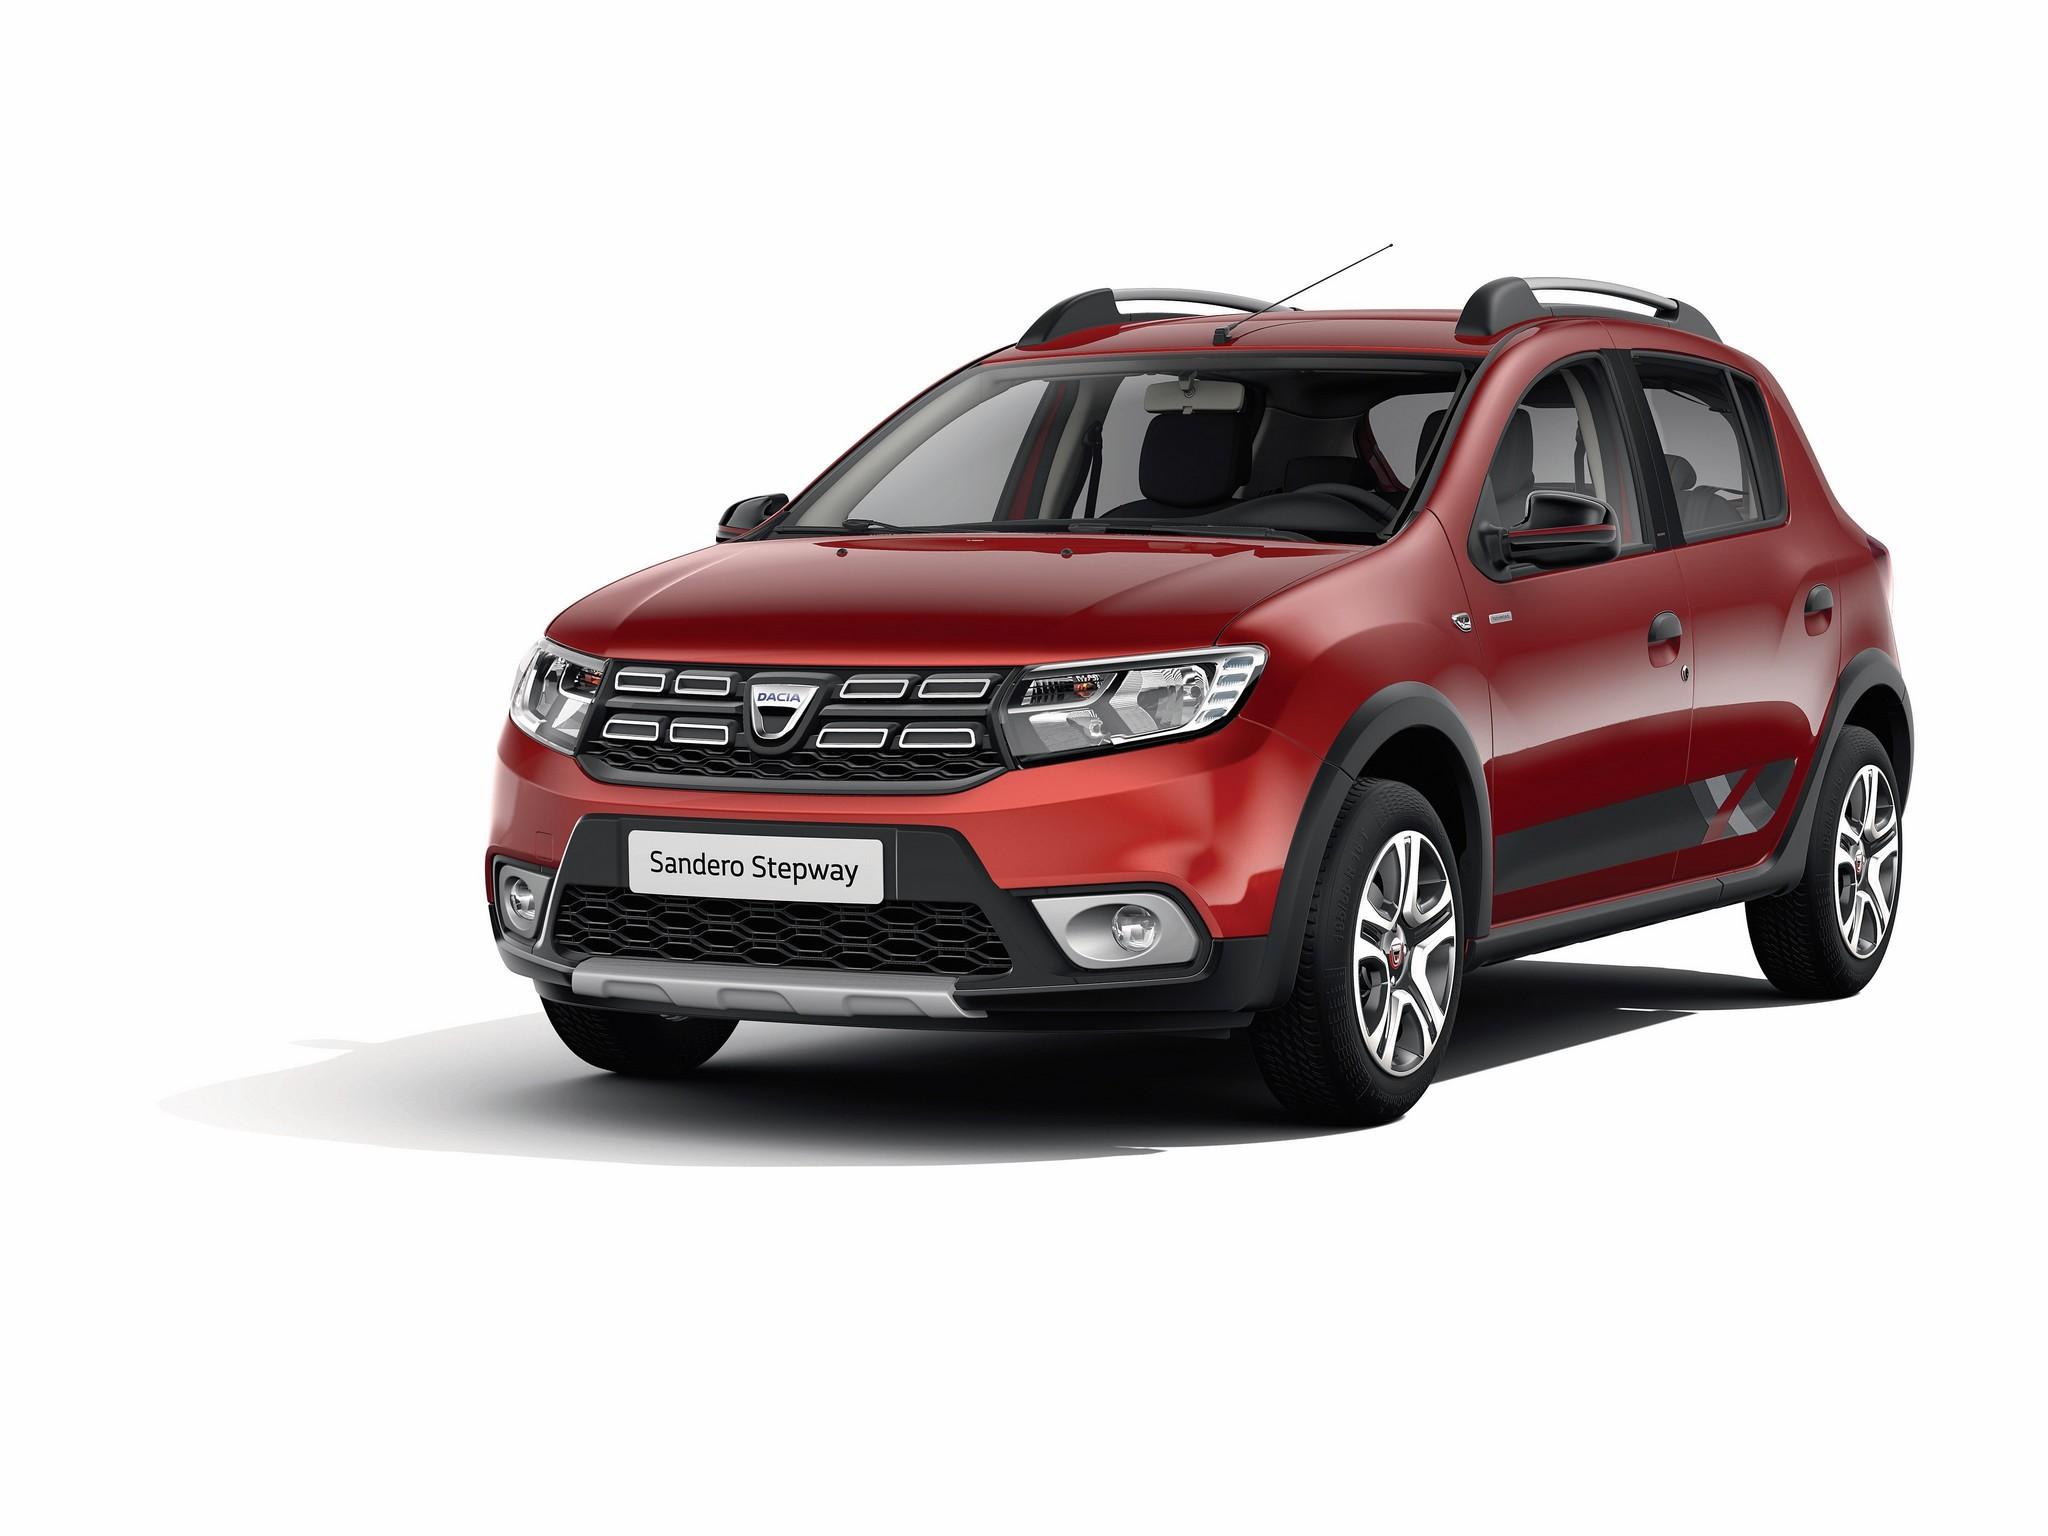 21222570_2019_-_Dacia_SANDERO_STEPWAY_Ultimate_Limited_Edition_or_Techroad